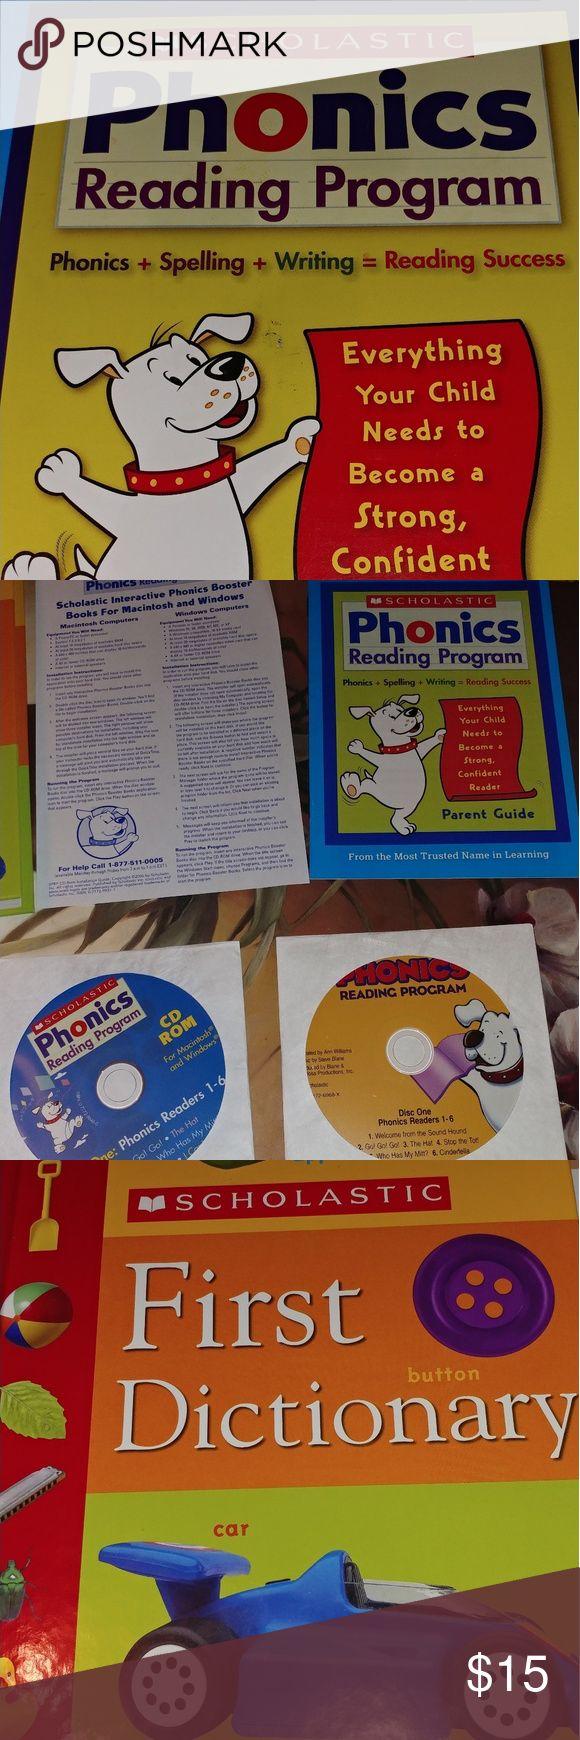 Scholastic reading program Dictionary, 3 beginner books, 2 CD, stickers, workbook and bingo game__parent handbook guide scholastic Other